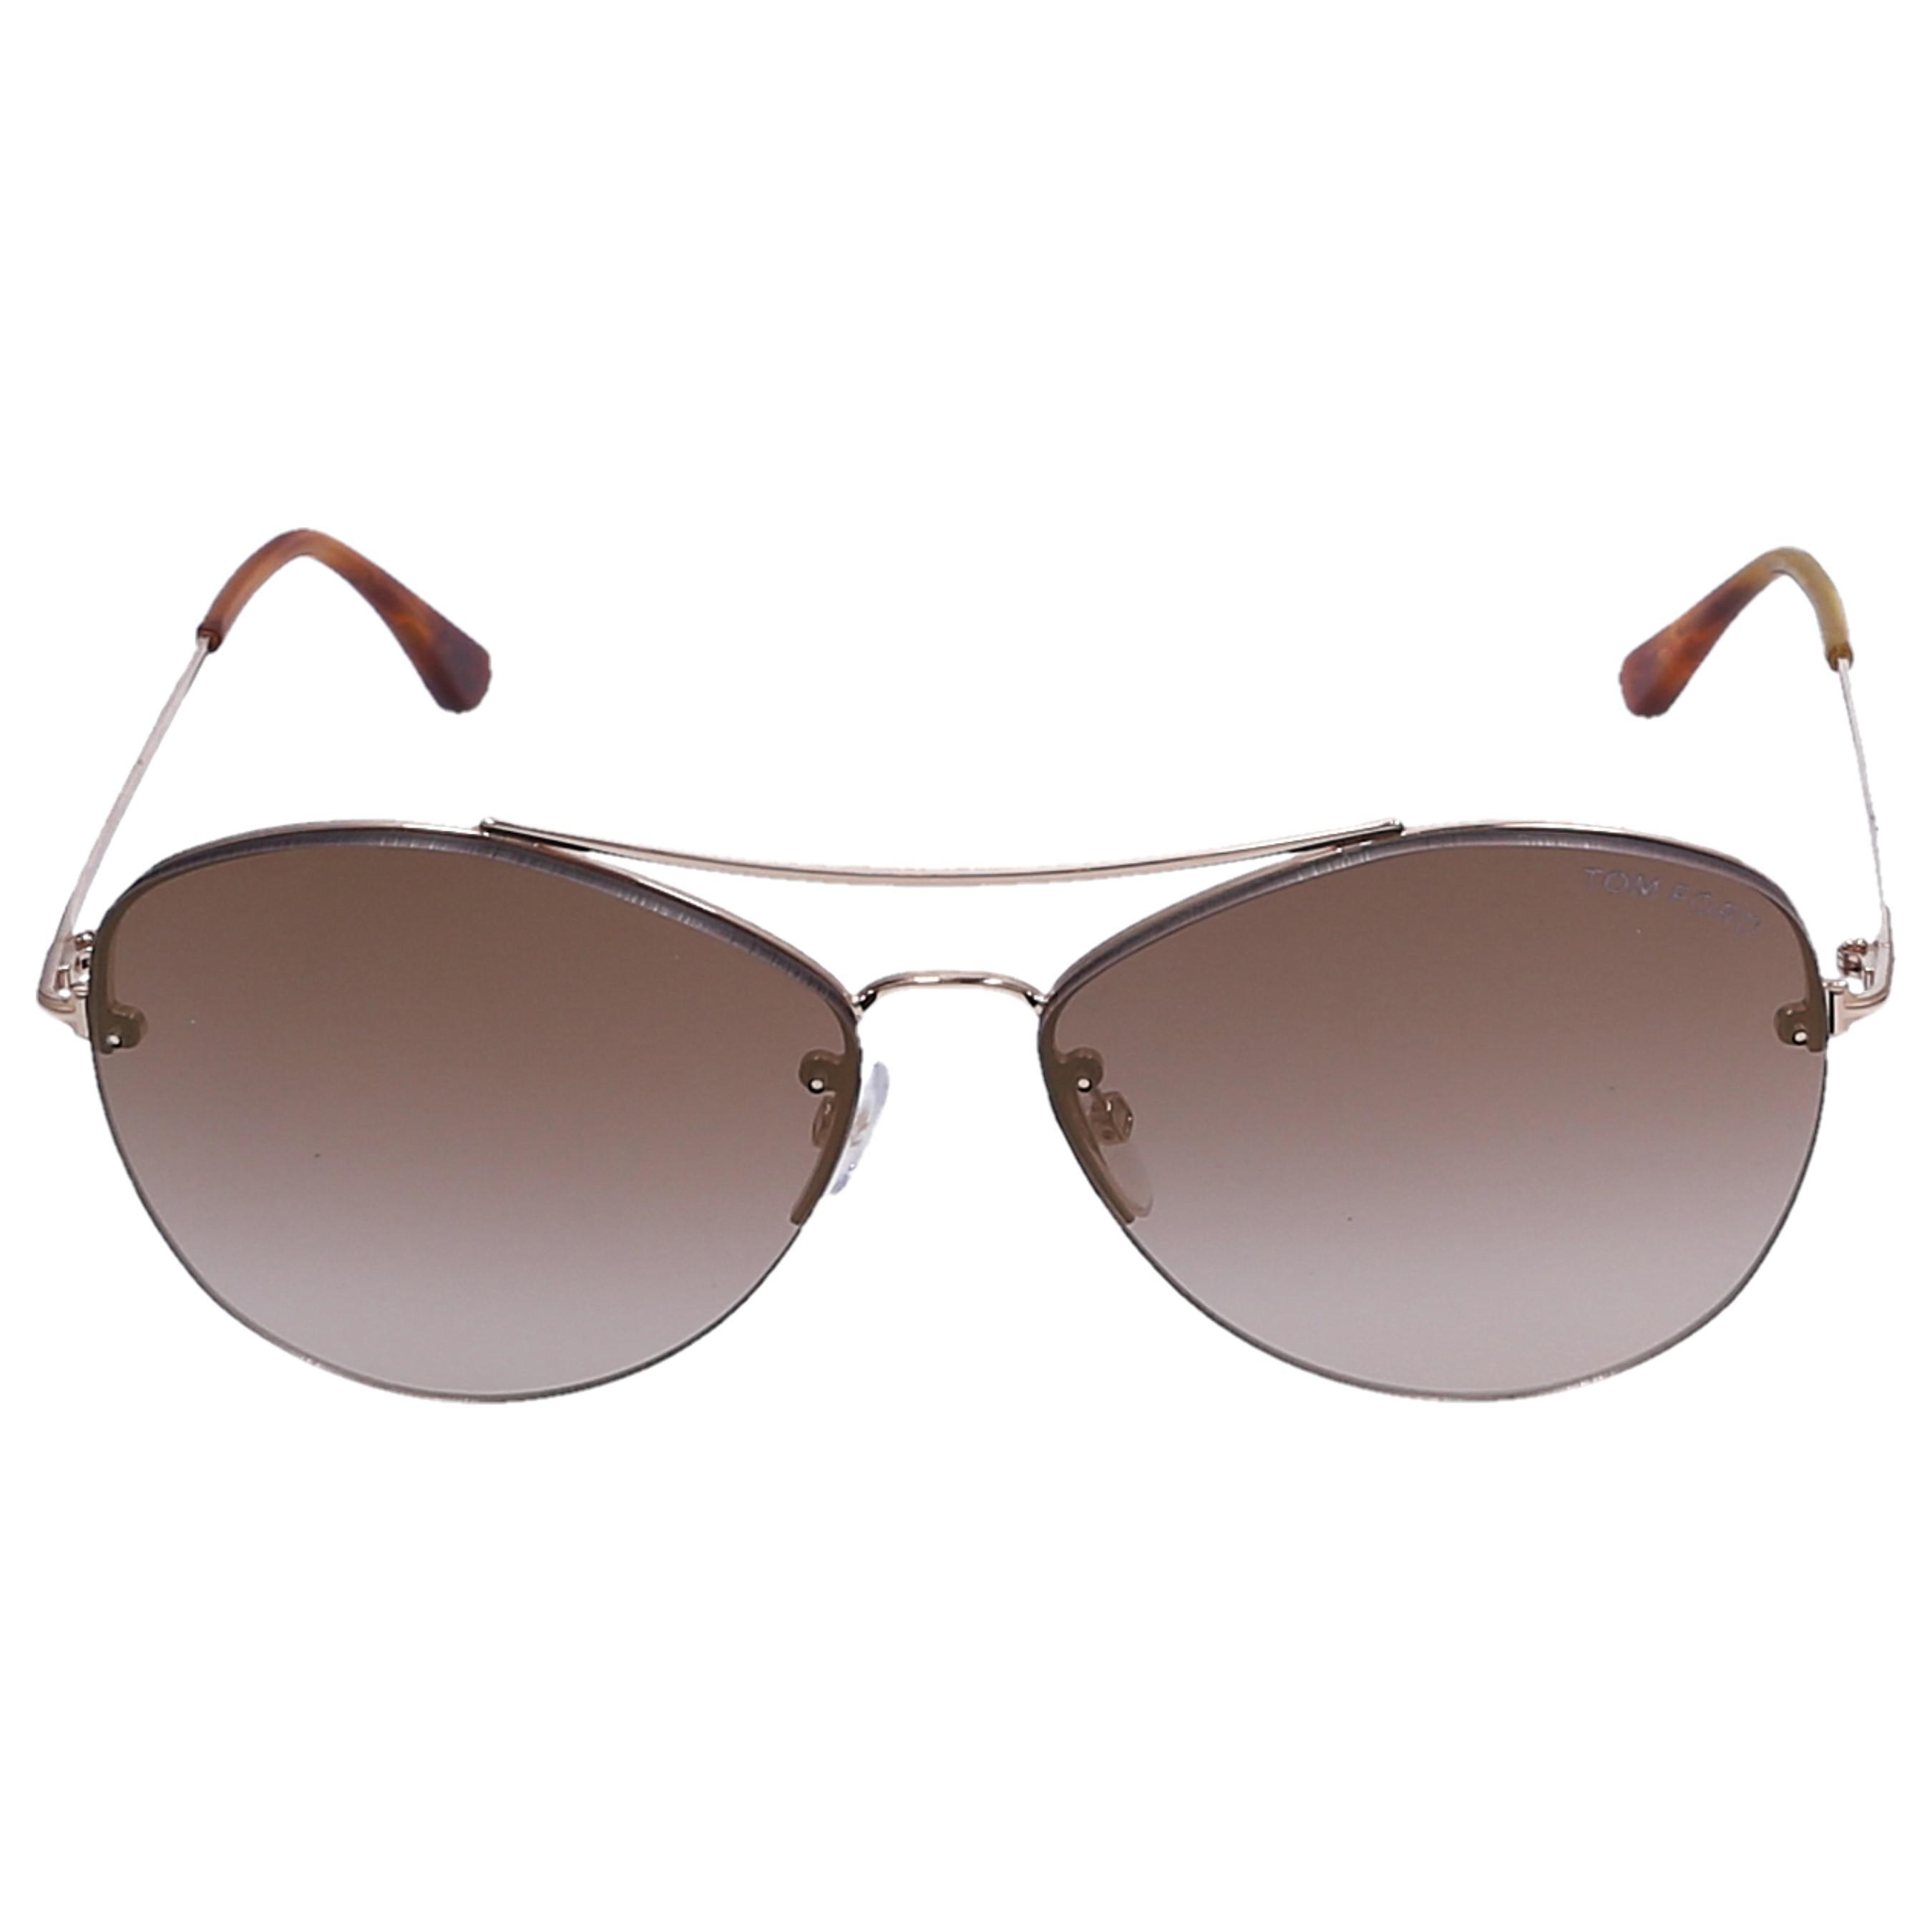 bf60b84ddca7e Lyst - Tom Ford Sunglasses Aviator 28g Metal Gold in Brown